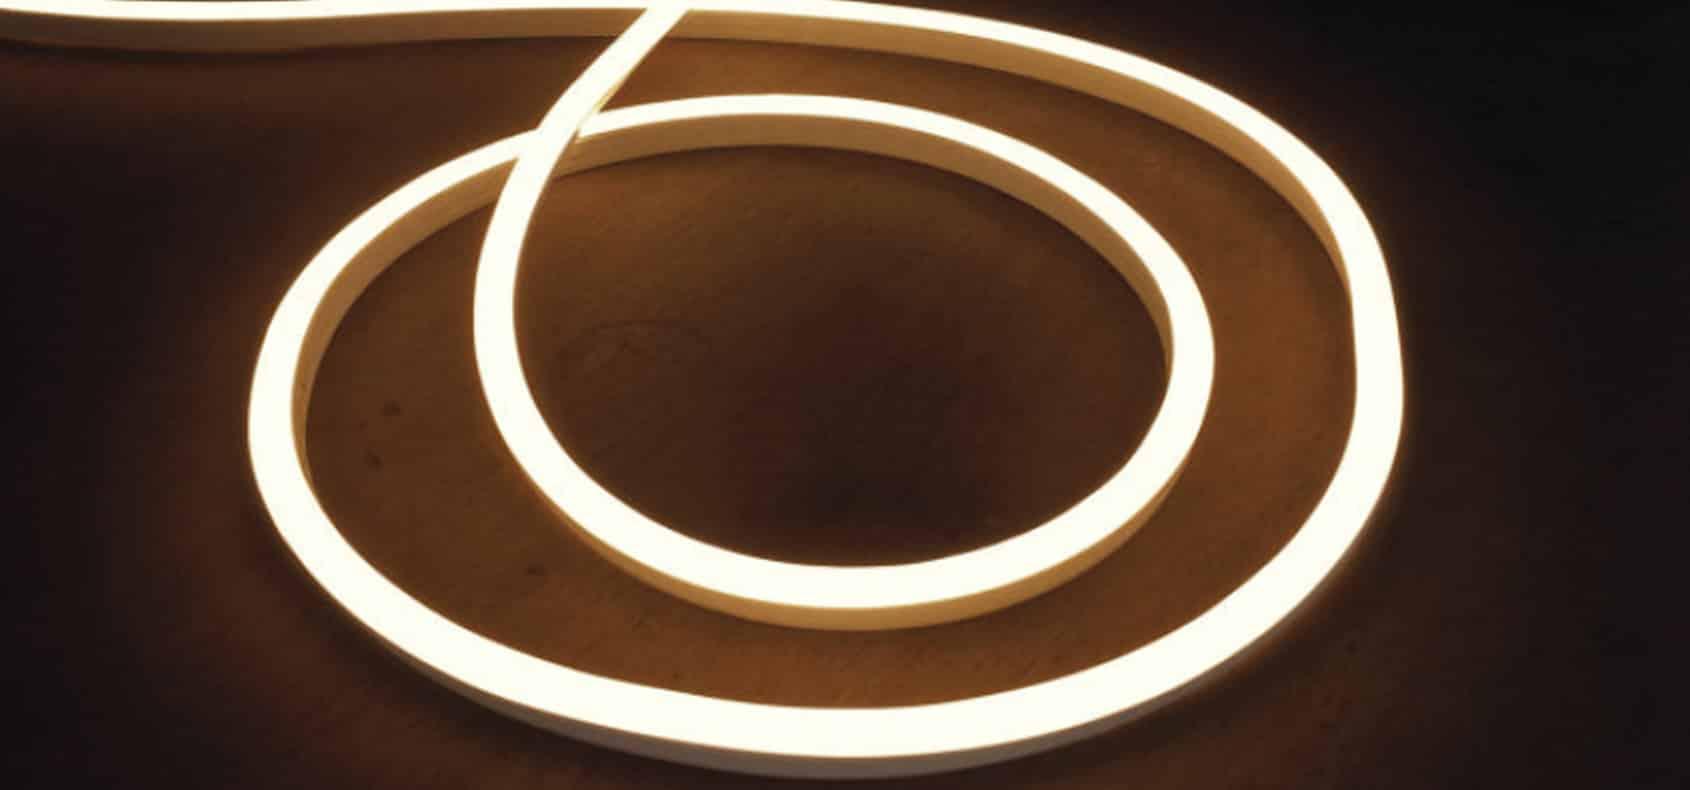 Neon Flex 270⁰, Upto 510LM/m output, >60mm bend radius, Swimming pool applications, IP68 & IK08 rating